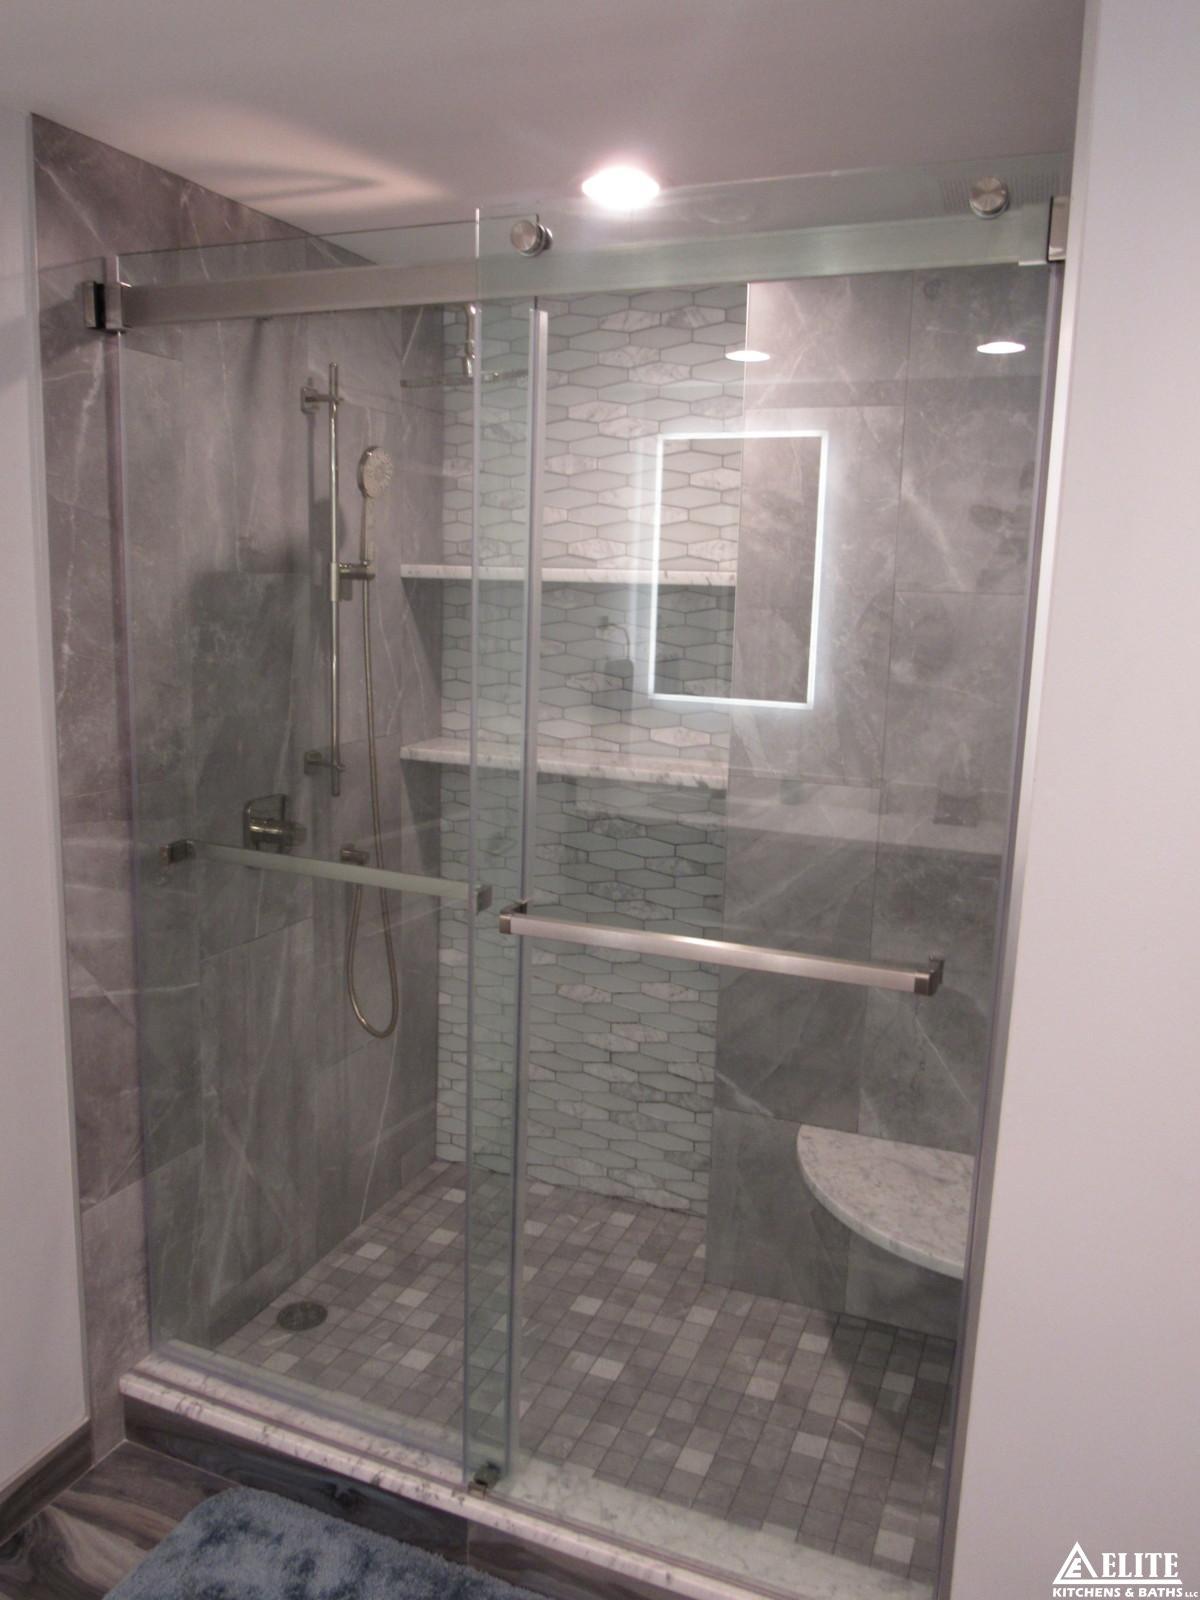 Bathrooms 112